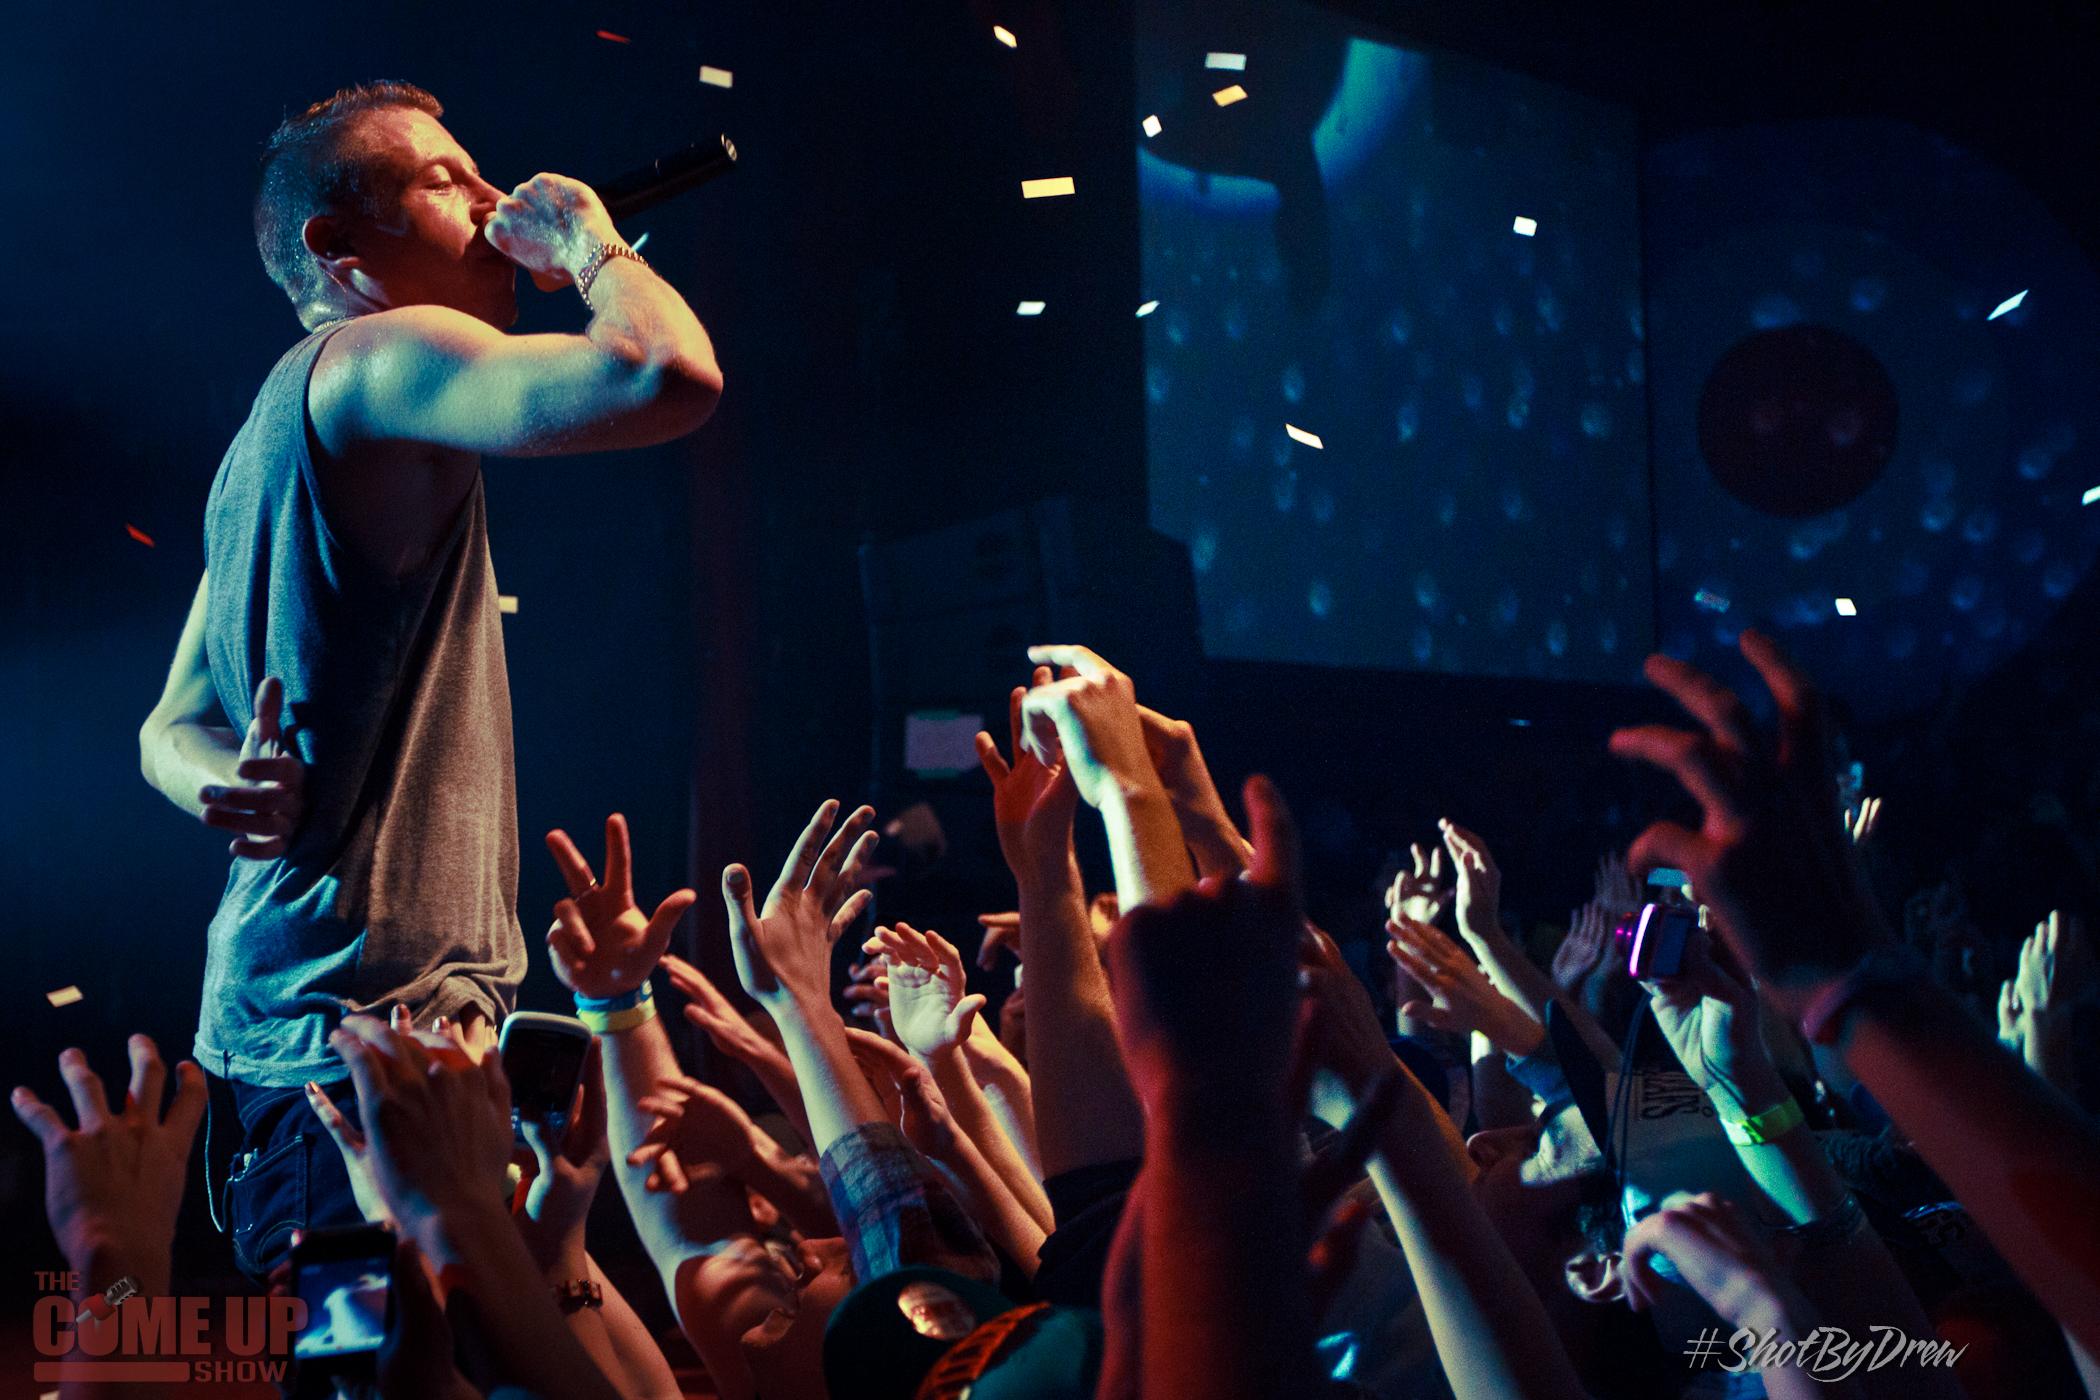 Macklemore and Ryan Lewis concert in Toronto